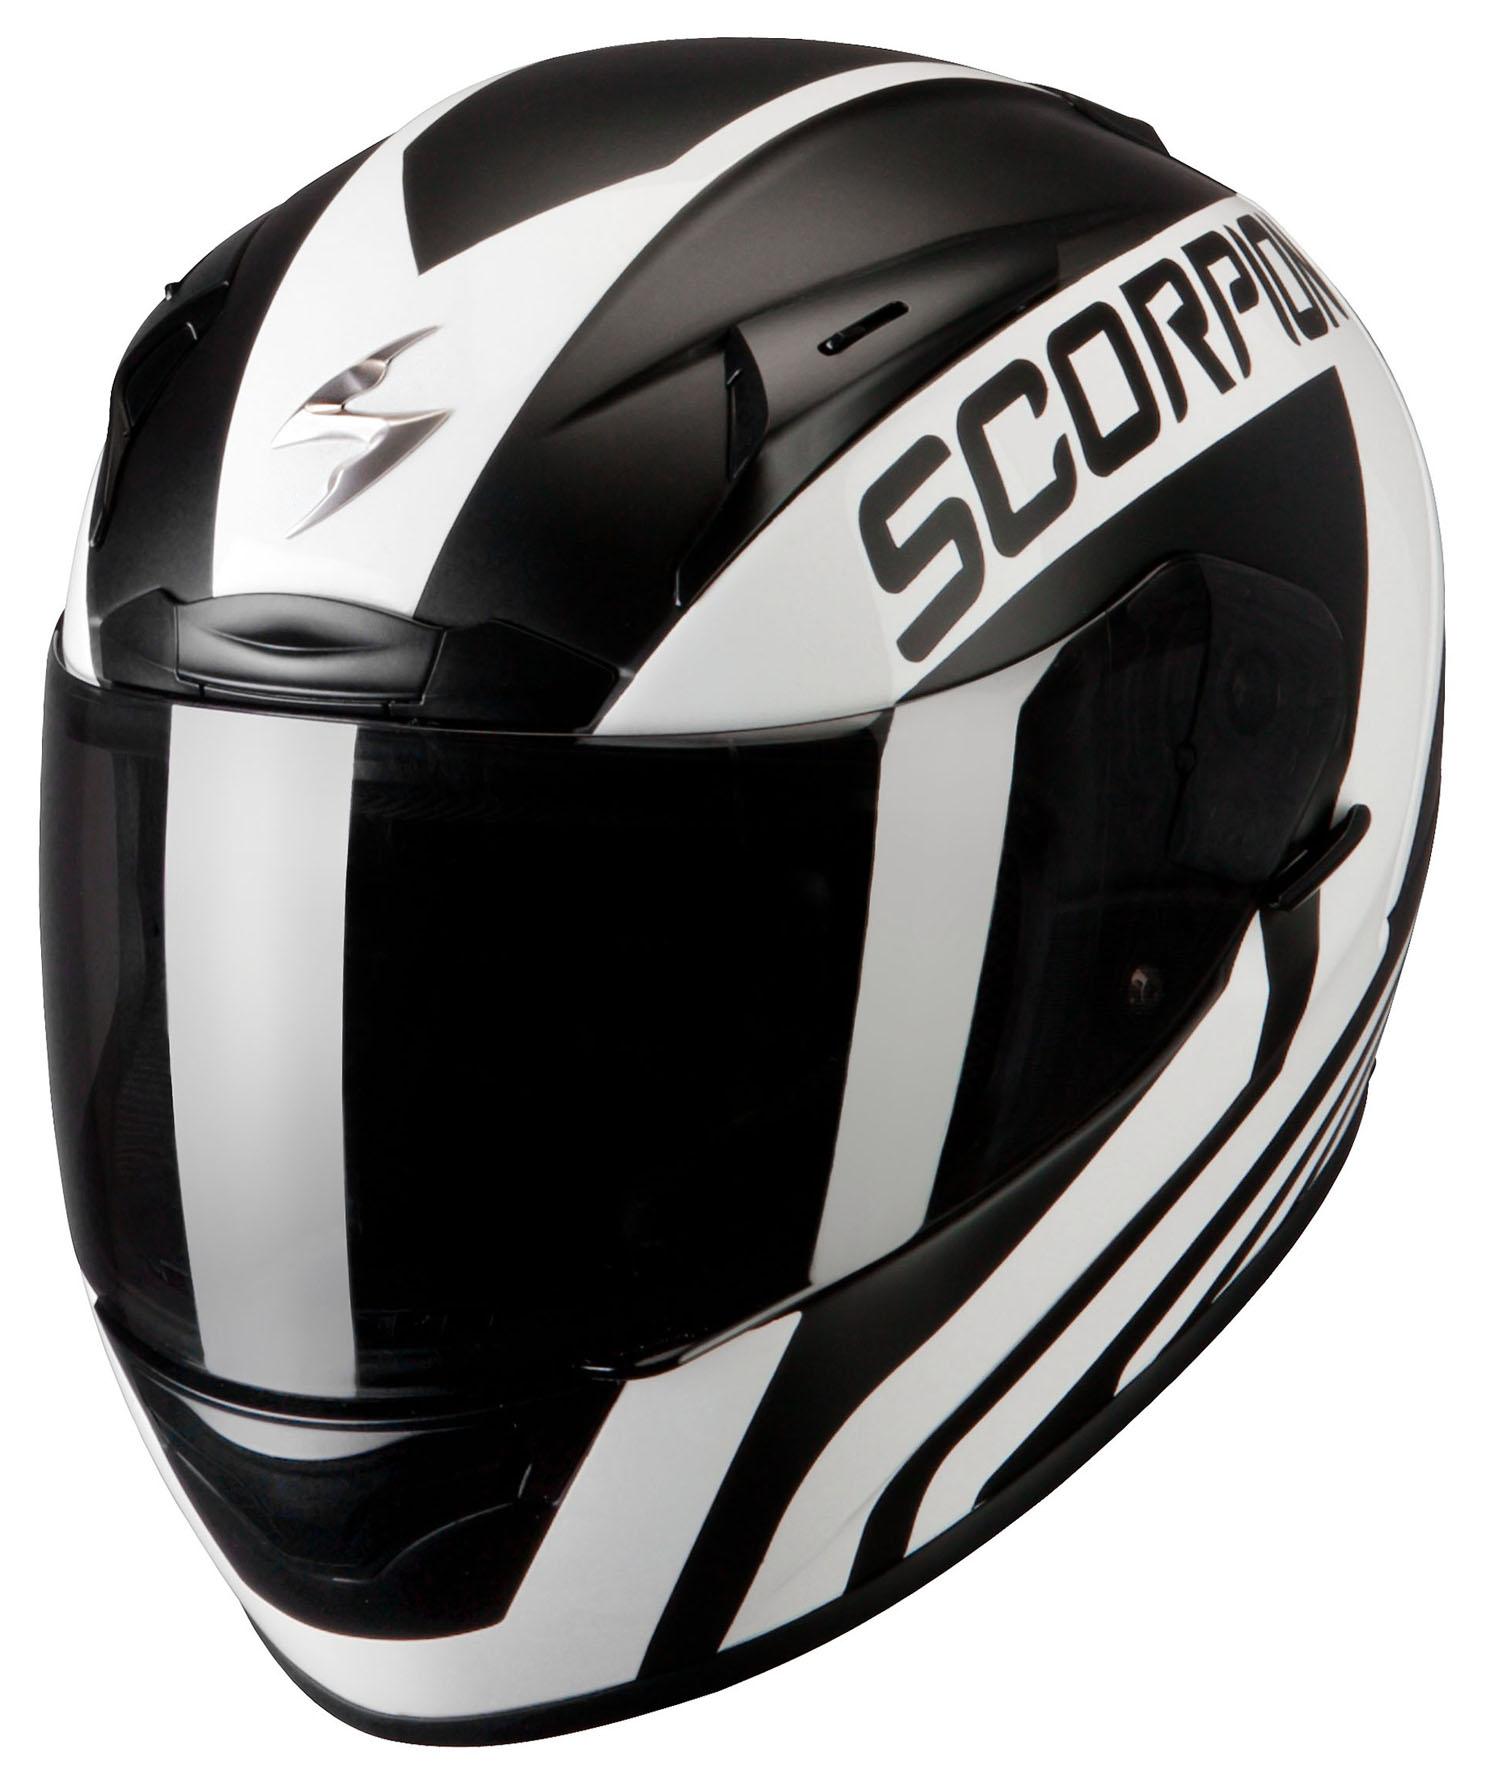 Casco Scorpion Exo 2000 Air